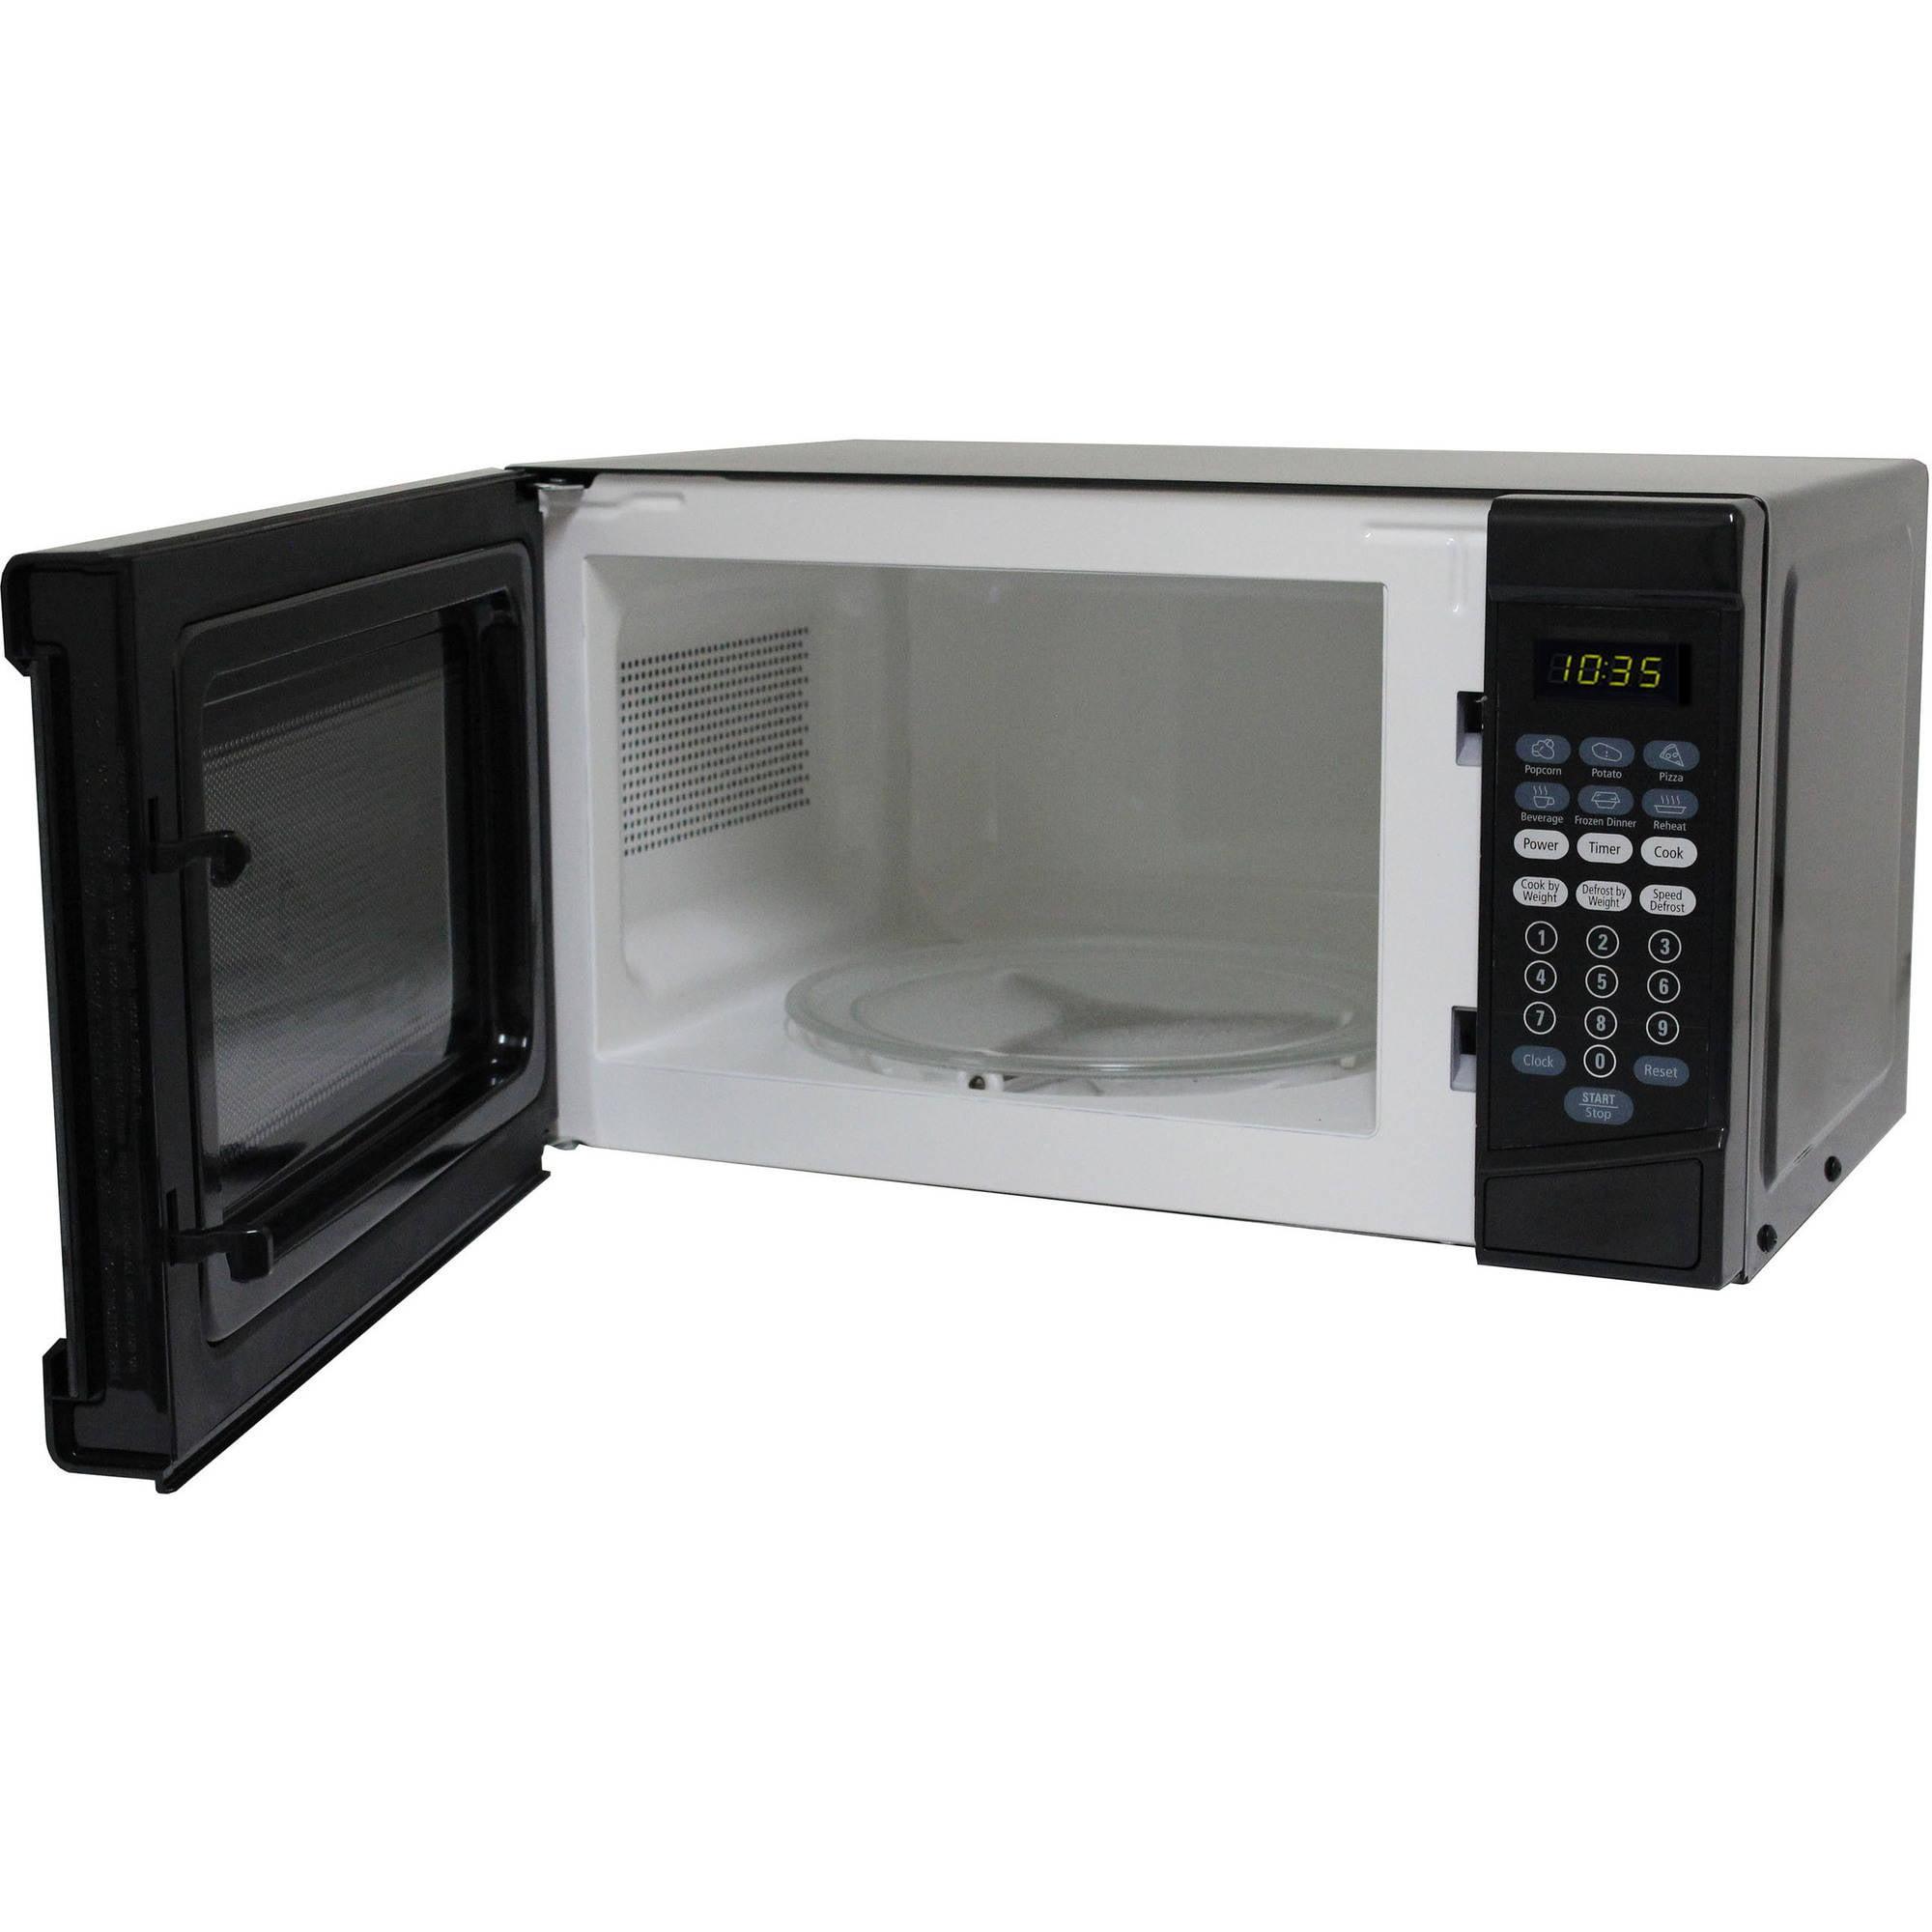 Sunbeam 0 7 Microwave Watt 700 Cuft Oven Sgke702 Black